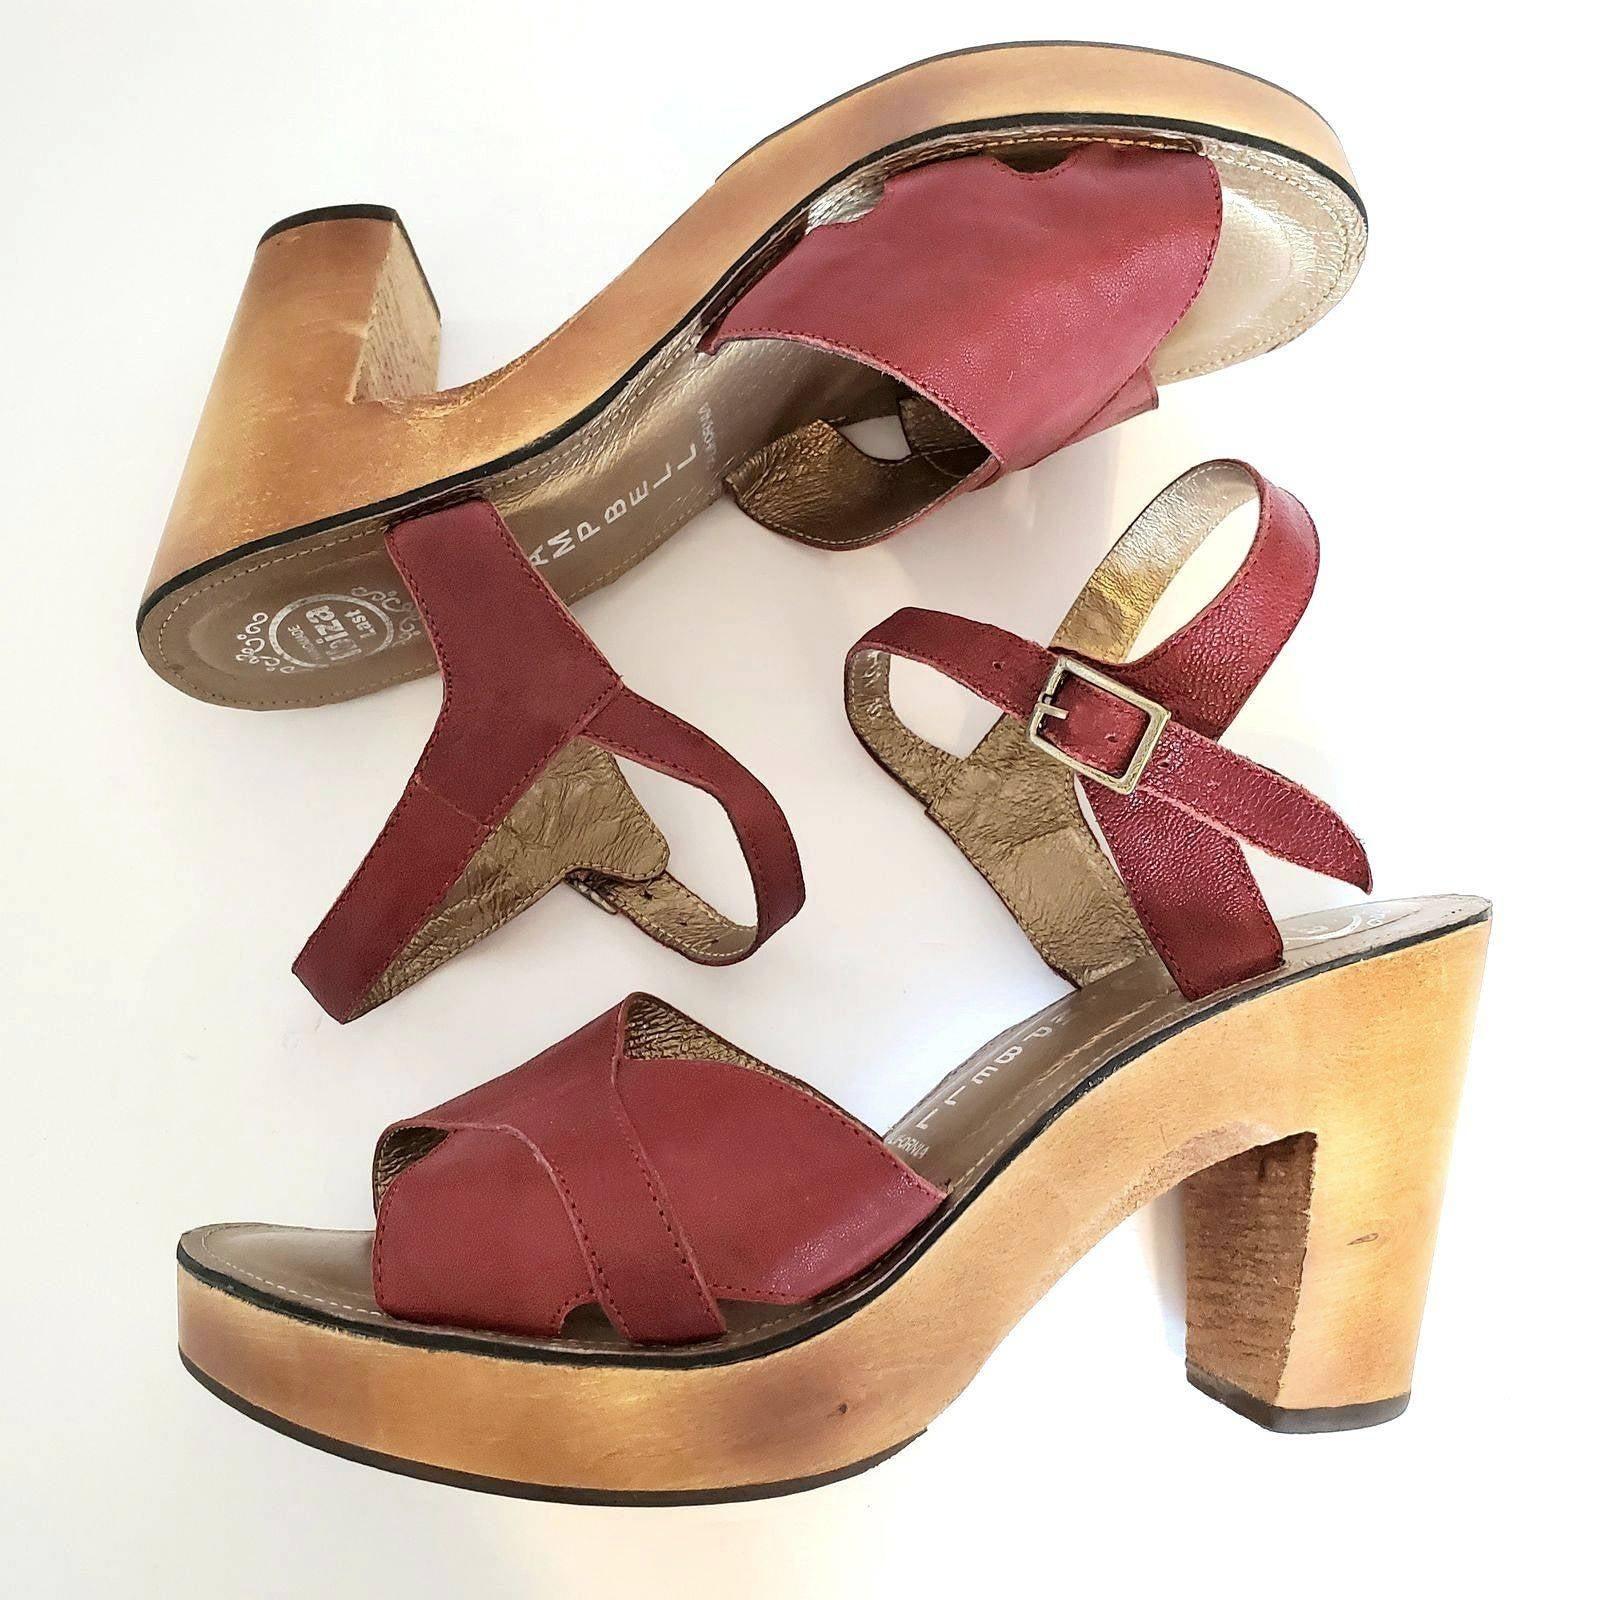 Jeffrey Campbell Ibiza Burgandy Sandals